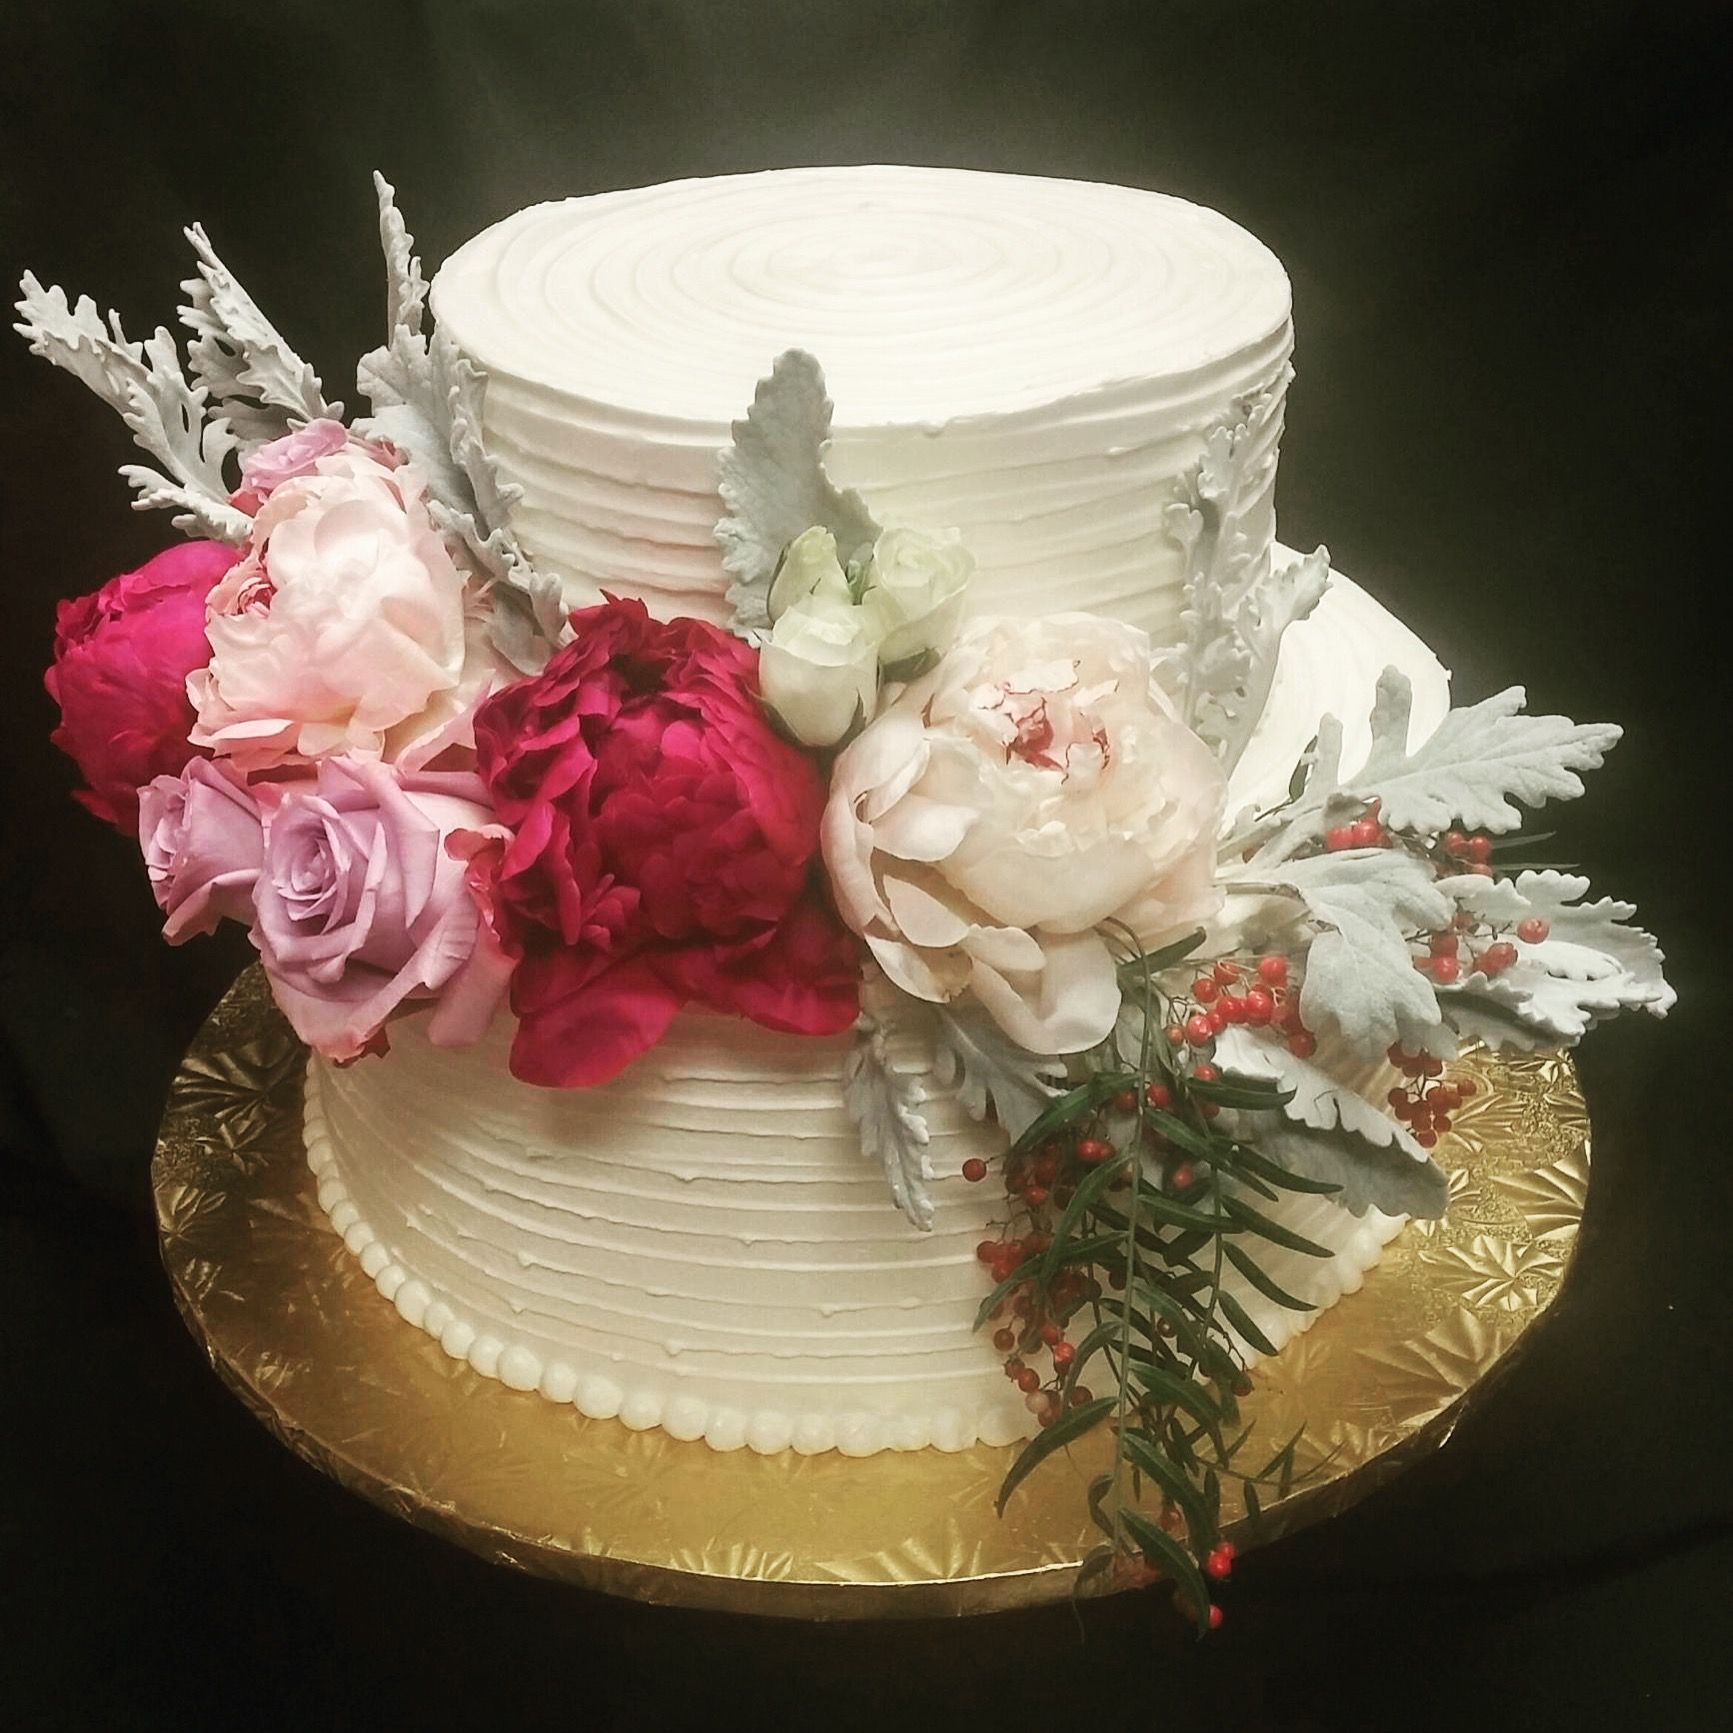 Cute 2 tier with fresh flowers fresh flower cake 2 tier